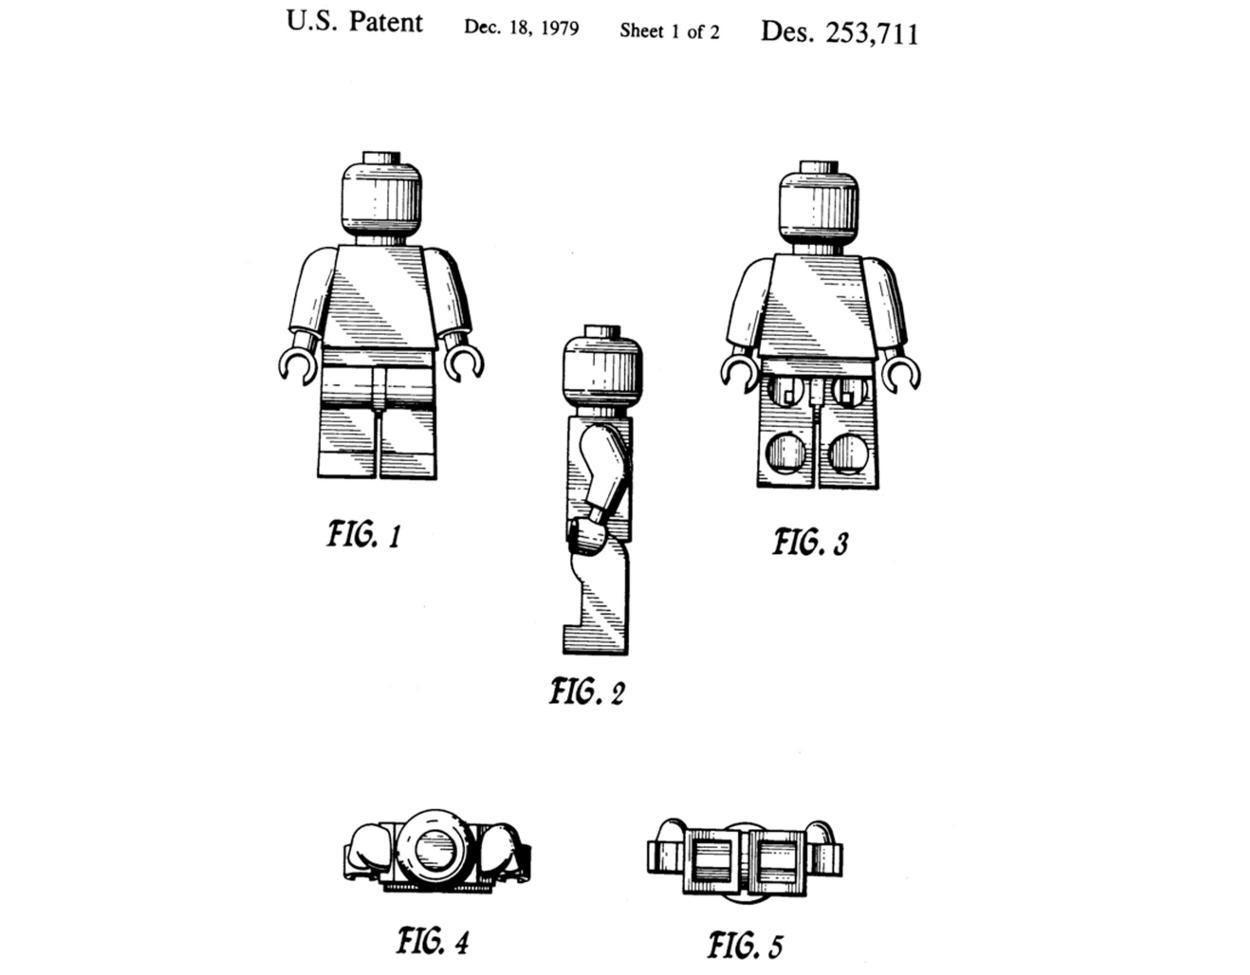 Lego Minifigure US patent